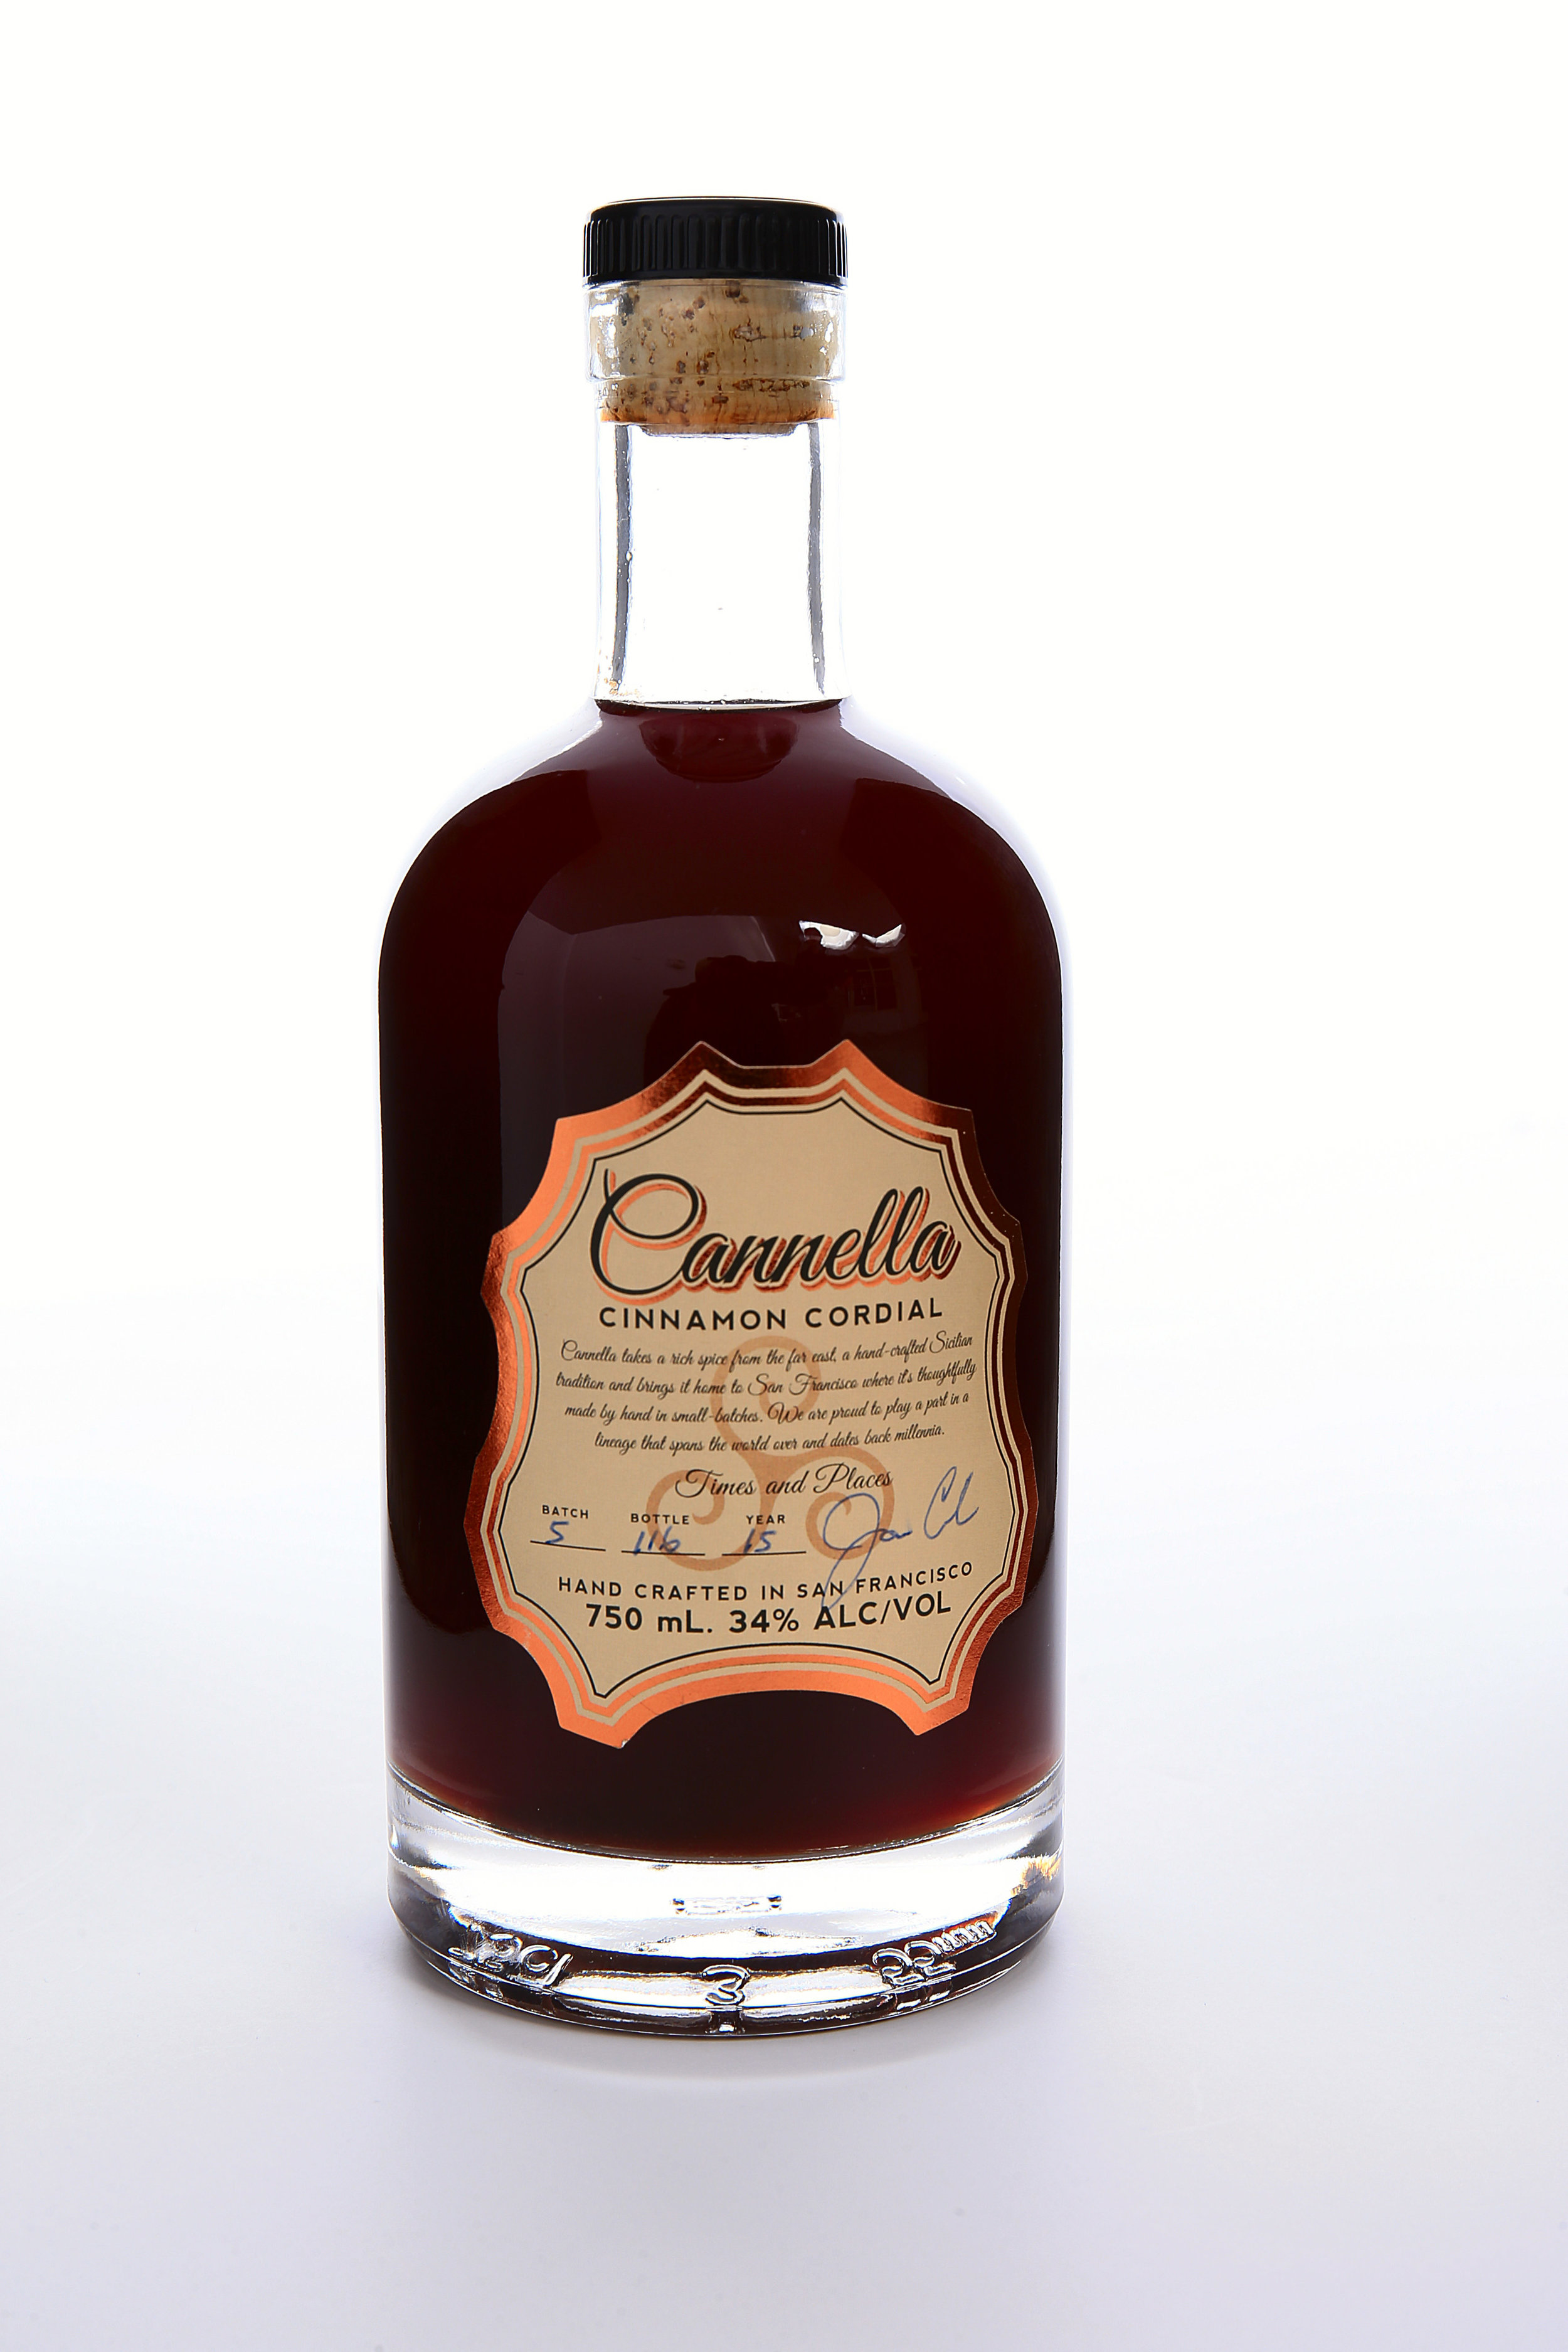 Cannella Cinnamon Cordial Bottle (1).jpg